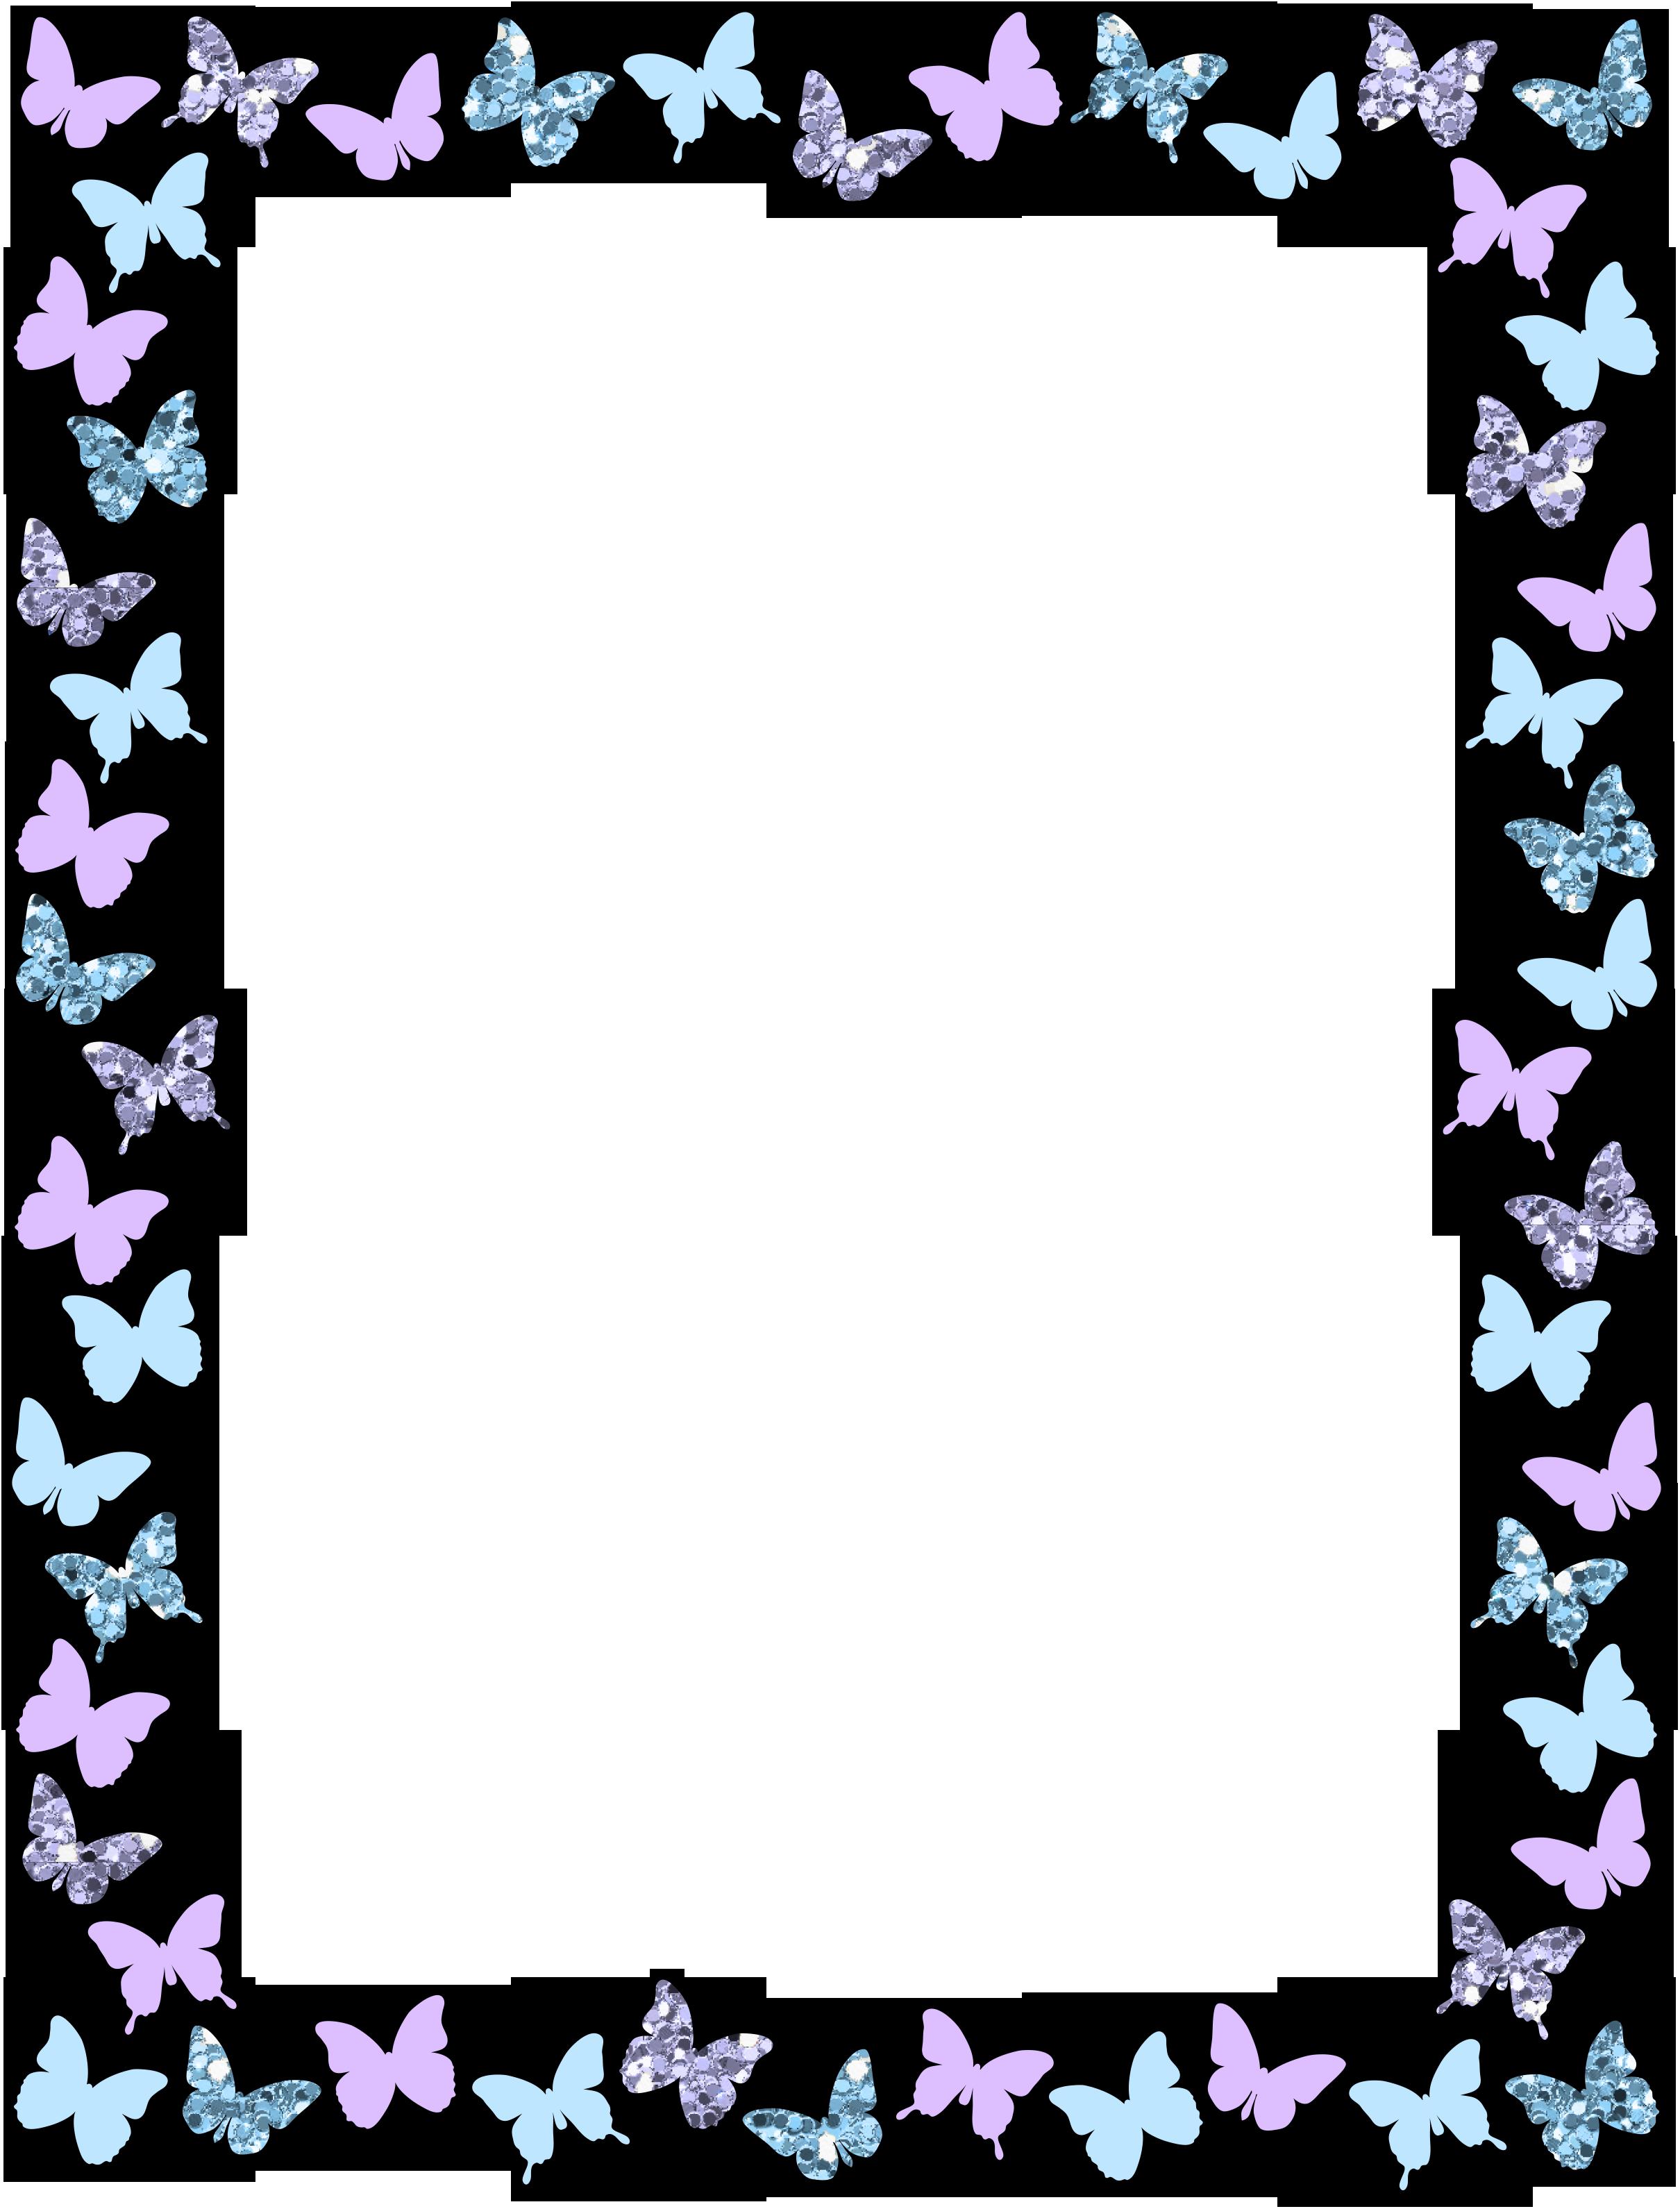 frame okul pinterest note paper scrap and rh pinterest com Lavender Rose Clip Art Hershey Kisses Clip Art Border